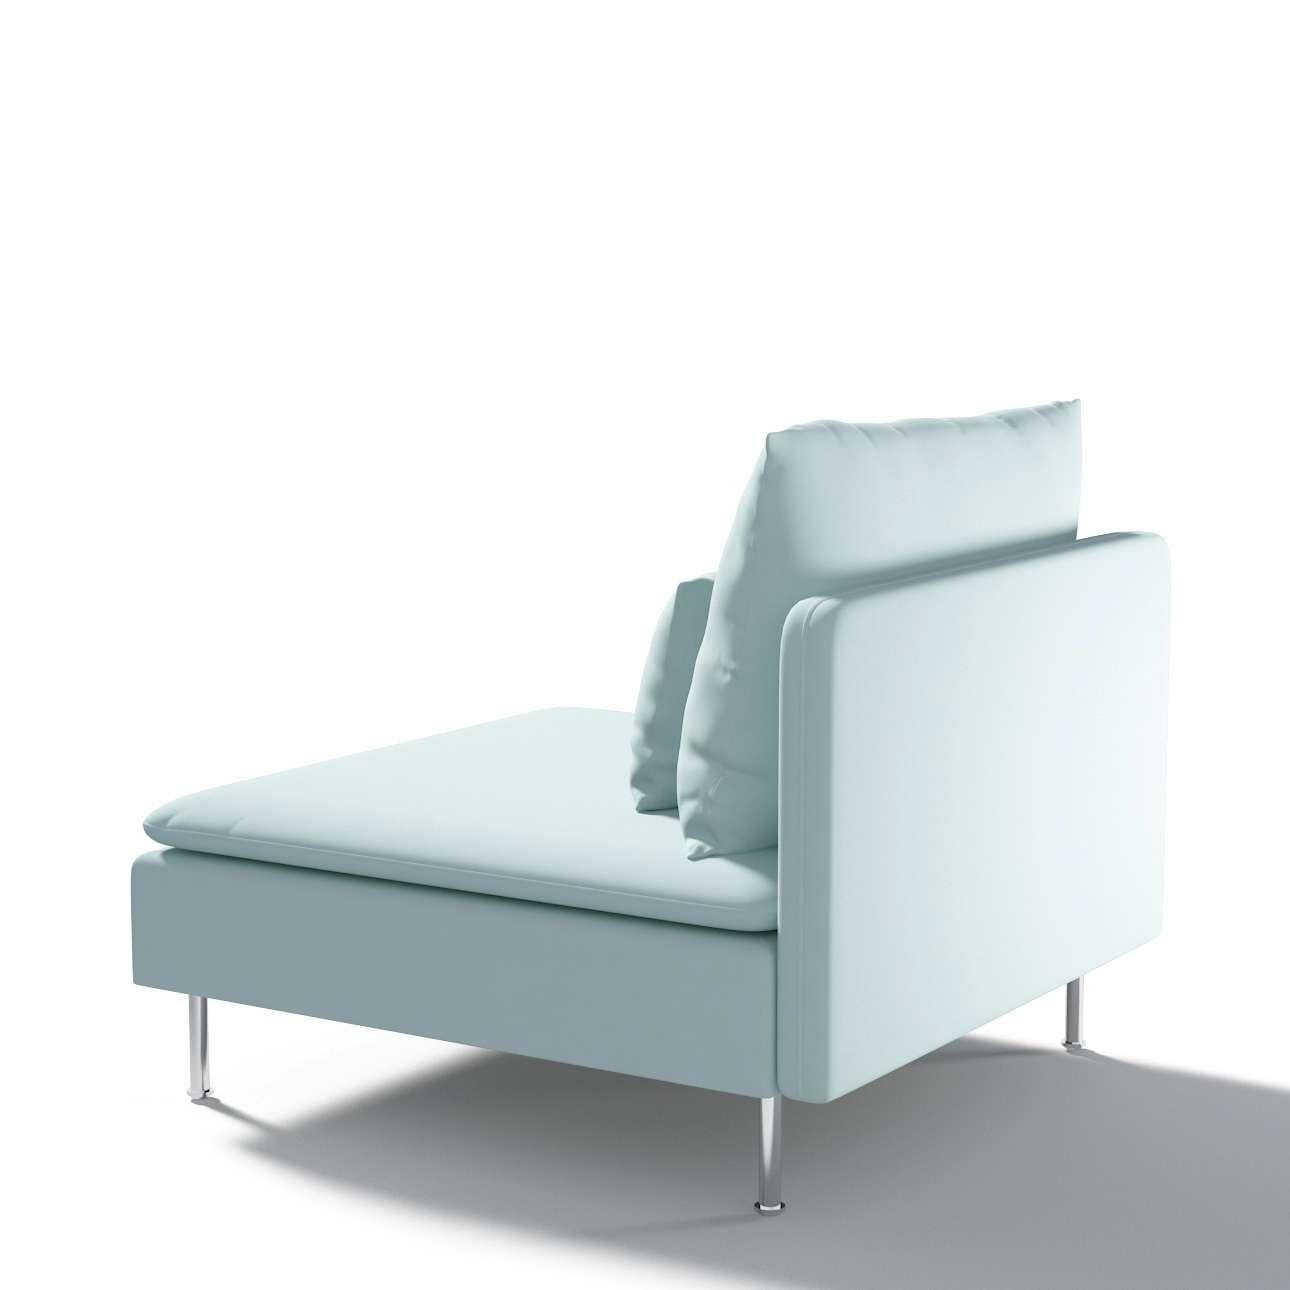 s derhamn cotton panama hellblau s derhamn bezug f r. Black Bedroom Furniture Sets. Home Design Ideas